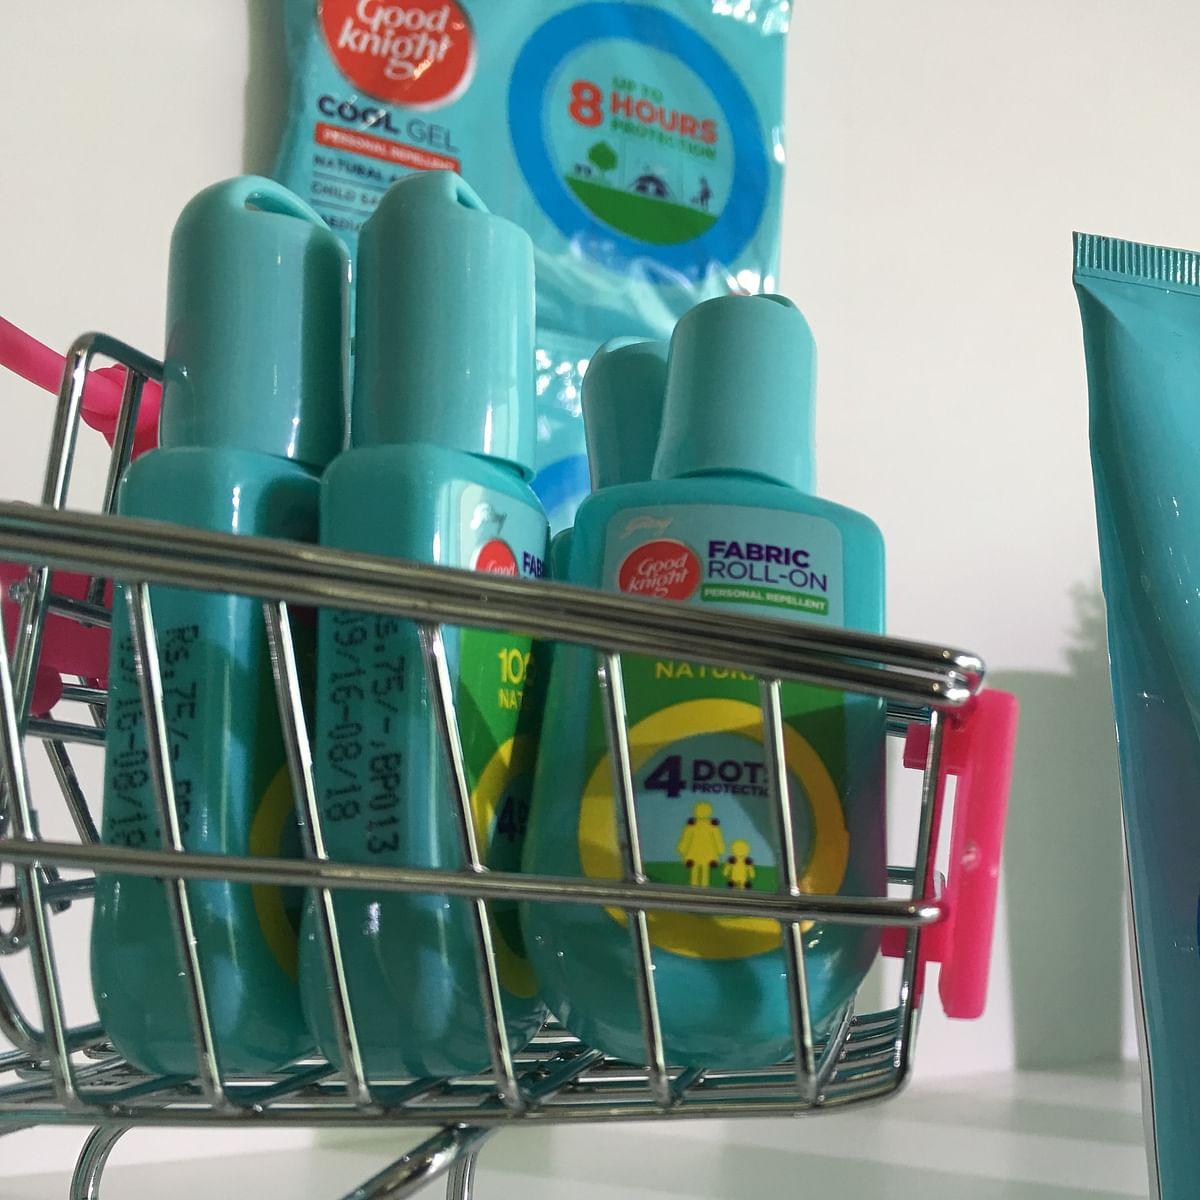 Godrej Consumer Q1 Results: Beat Estimates, Volume Growth at 15%